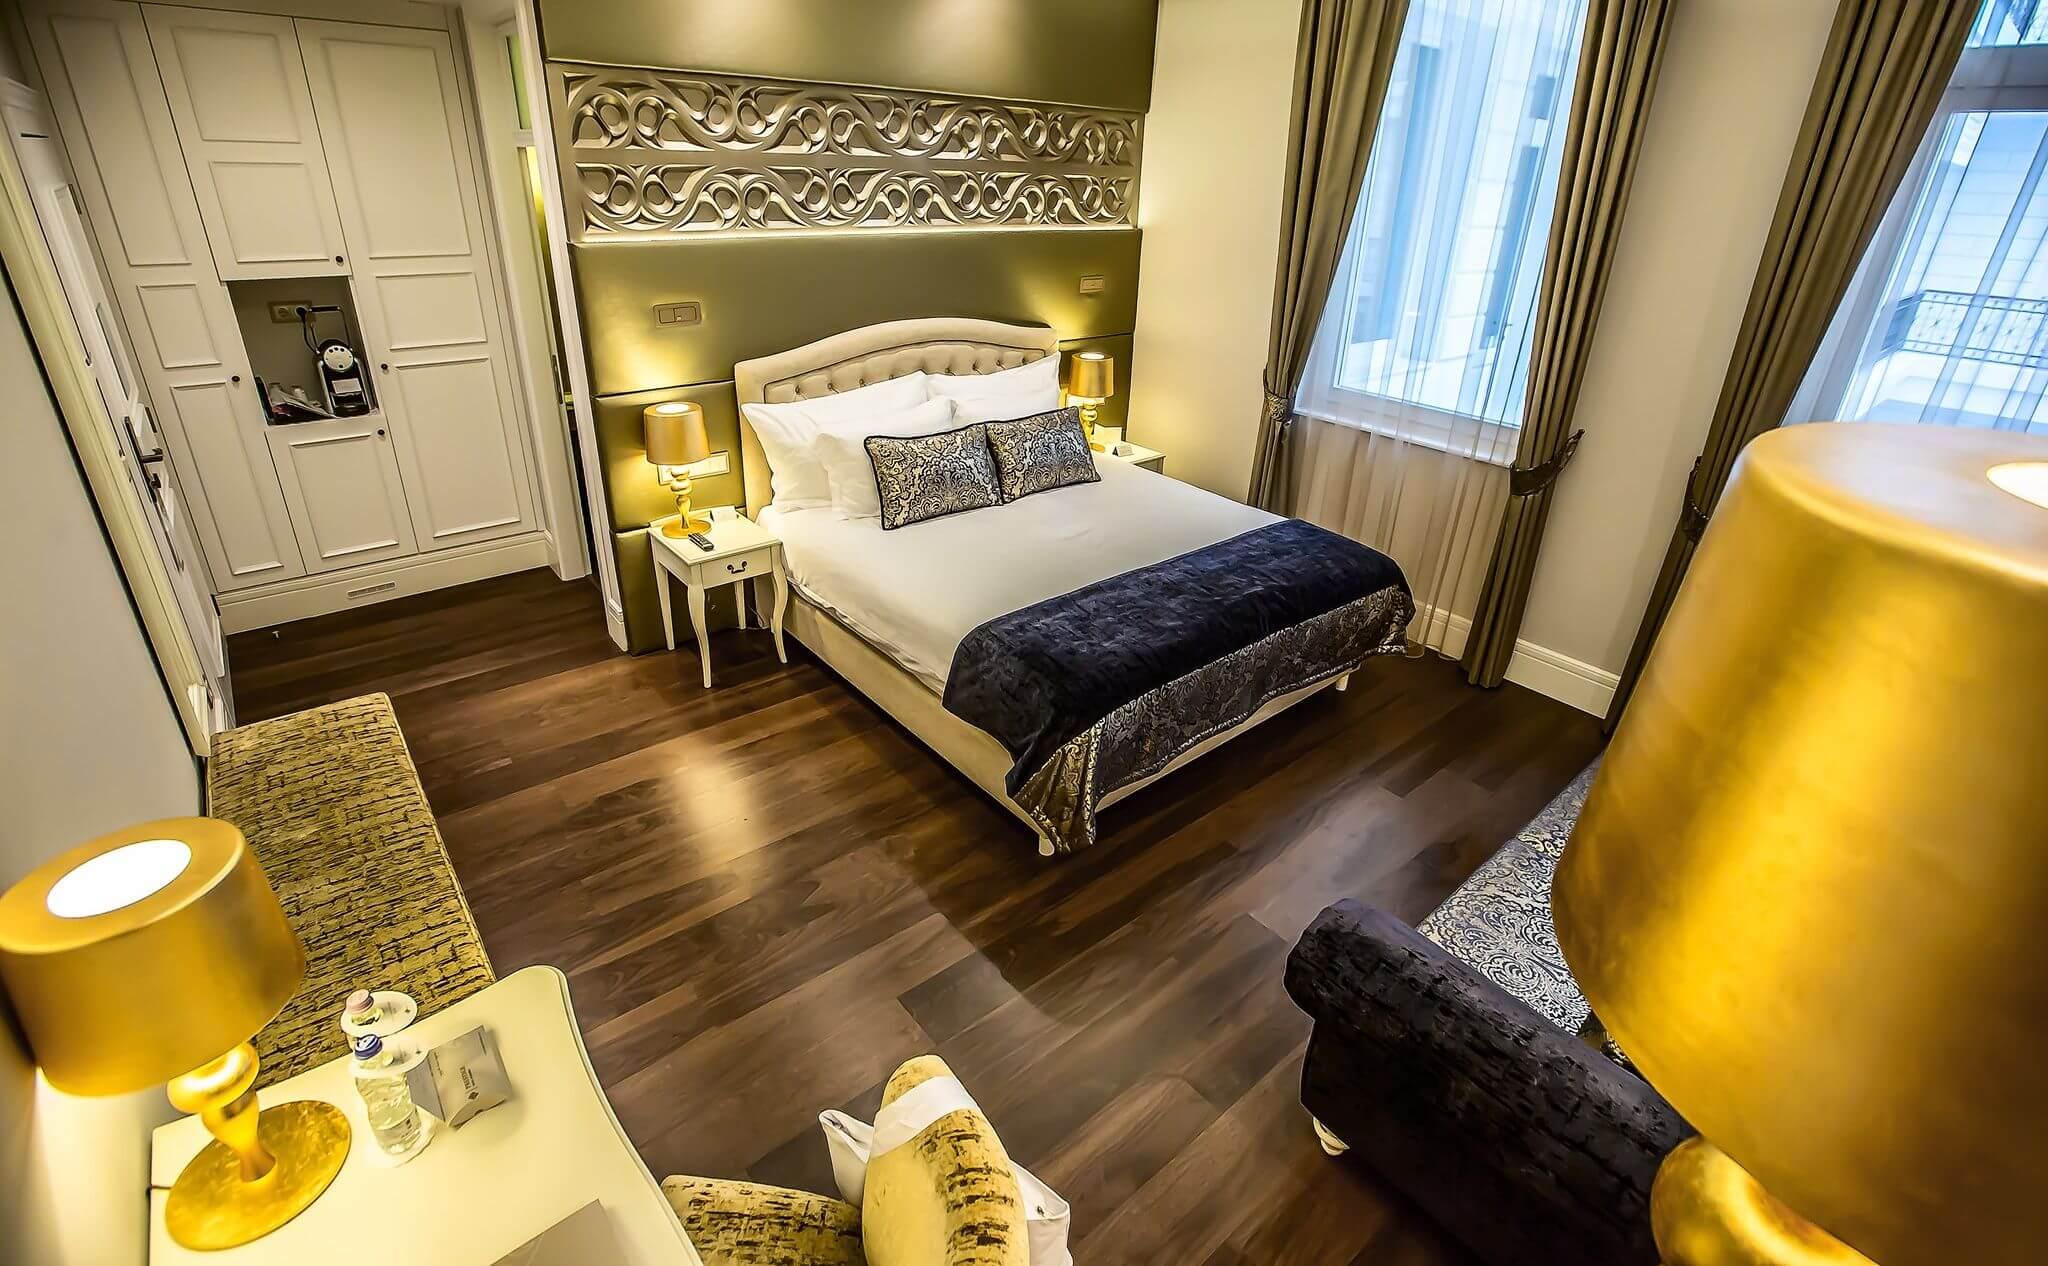 Prestige Hotel Budapest מלונות בודפשט מקום מרכזי מלון פרסטיז' 4 כוכבים